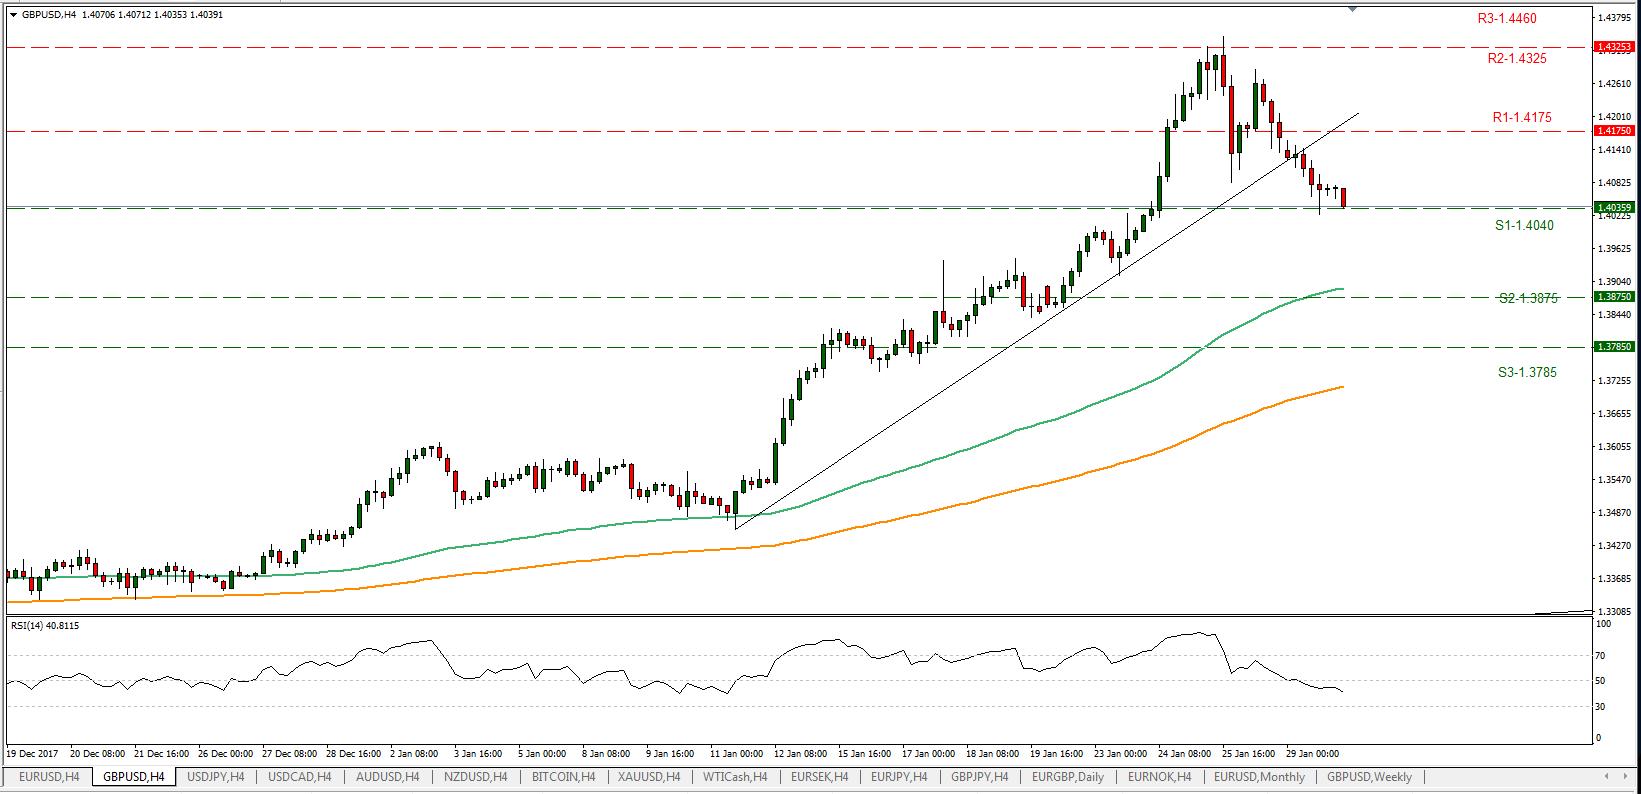 GBP/USD 30/01/2018 | Econ Alerts